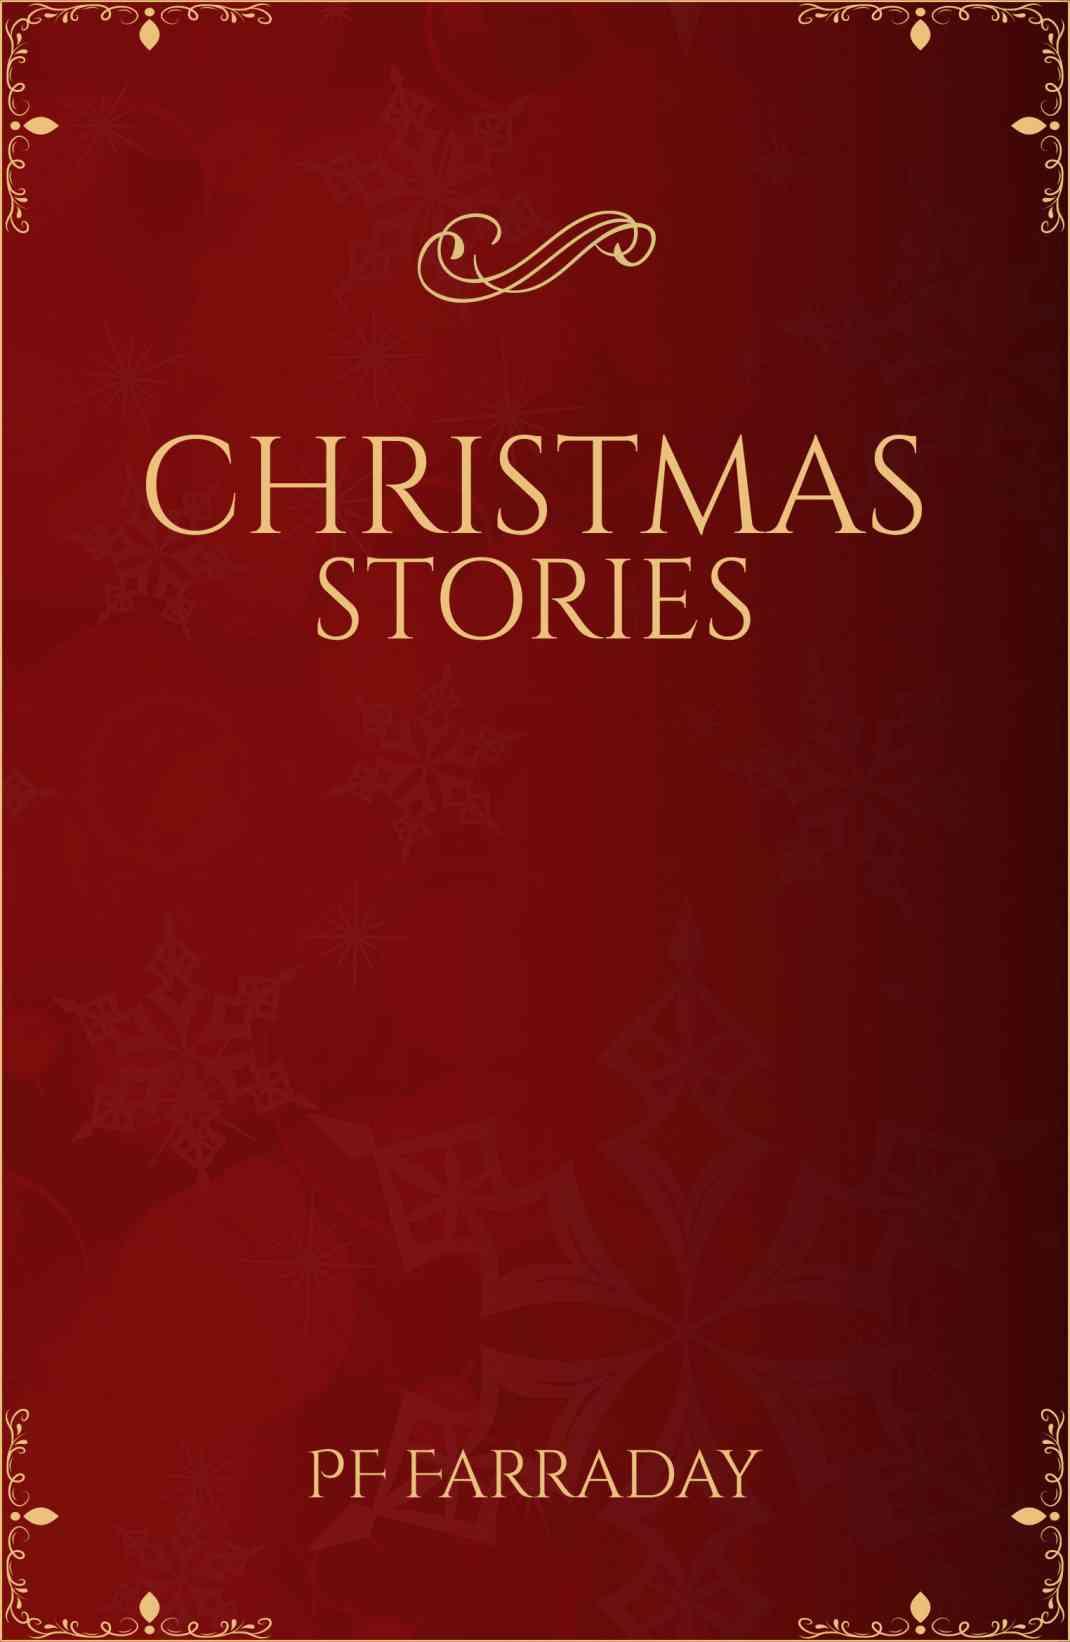 Short Christmas Stories.Christmas Stories Book Austin Macauley Publishers